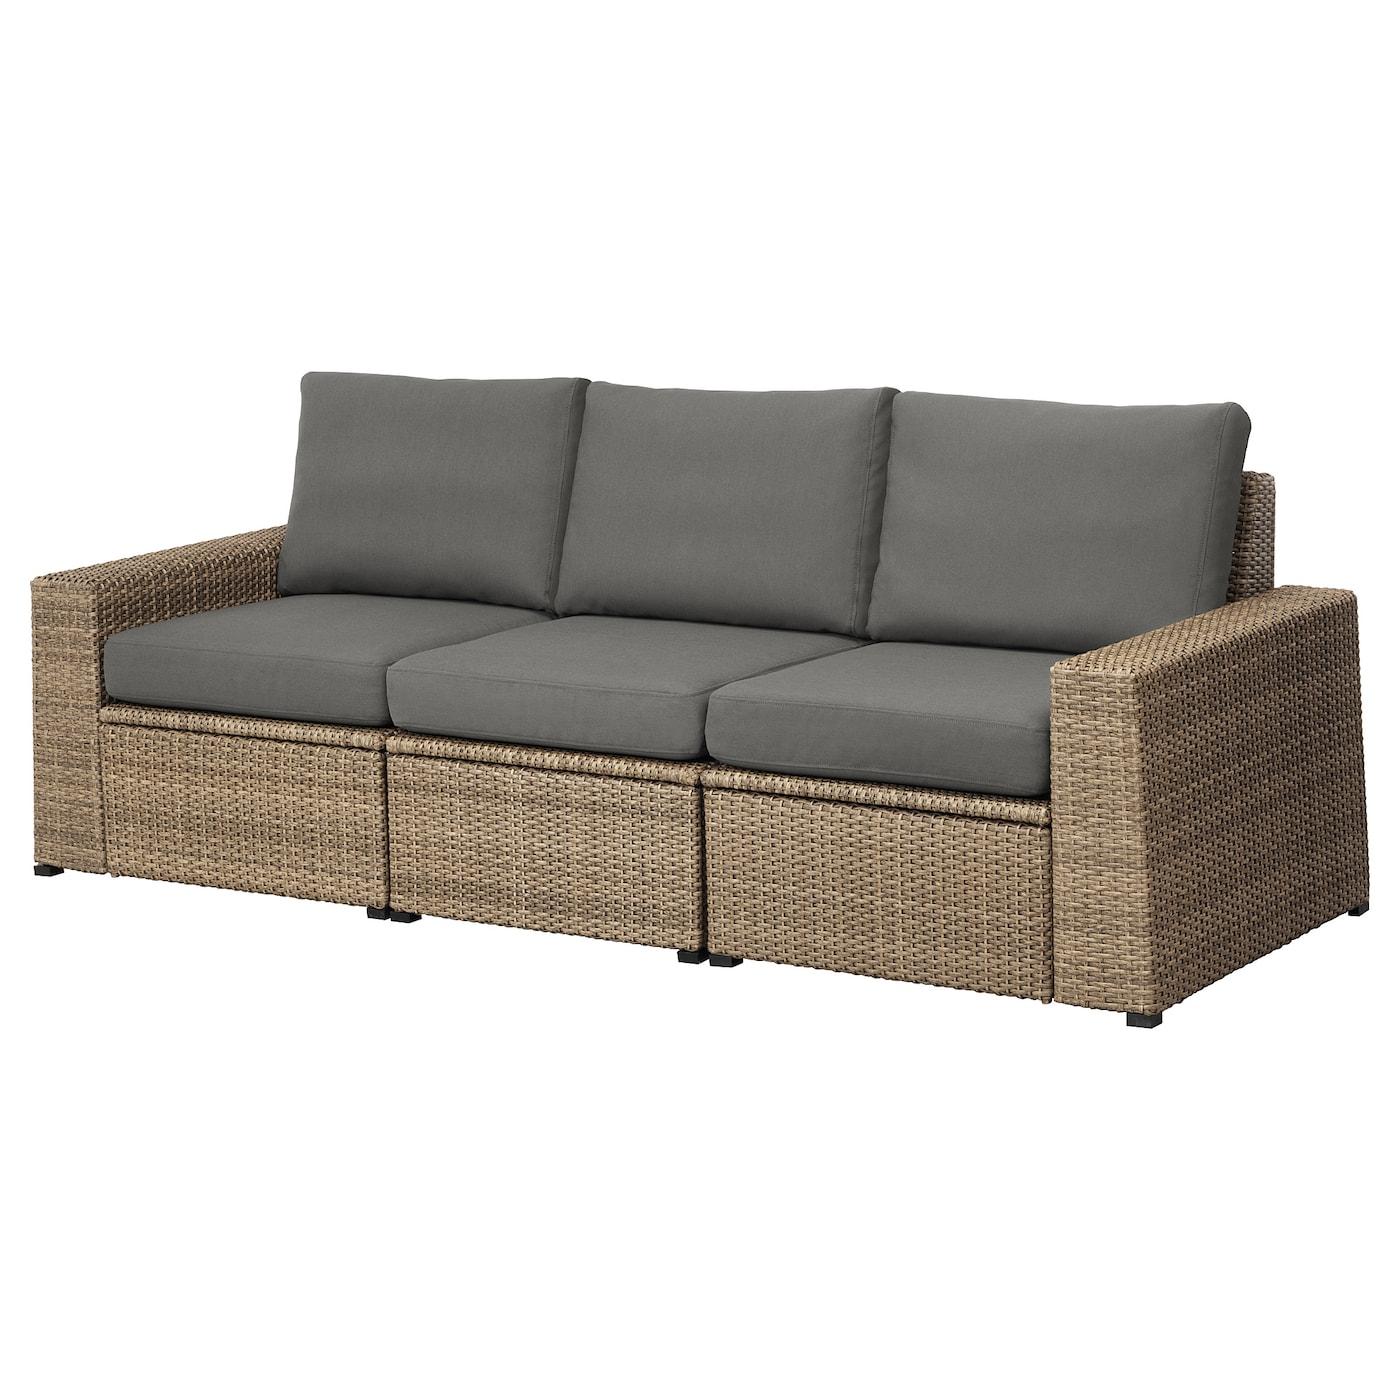 ikea outdoor sofa ikea outdoor sofas ireland dublin thesofa. Black Bedroom Furniture Sets. Home Design Ideas